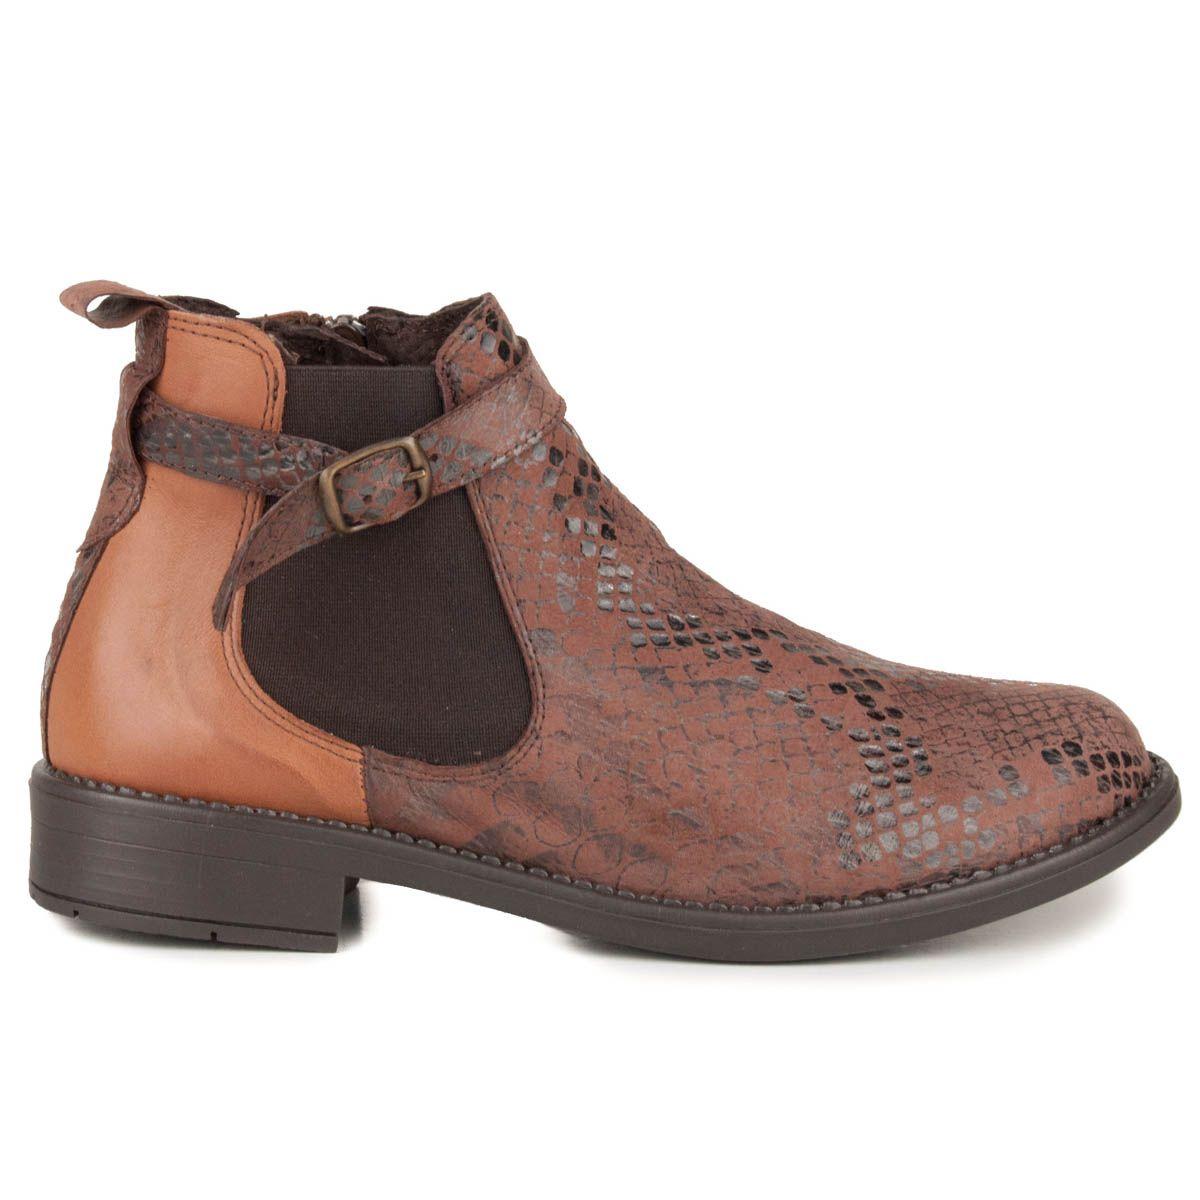 Montevita Chelsea Boot in Brown